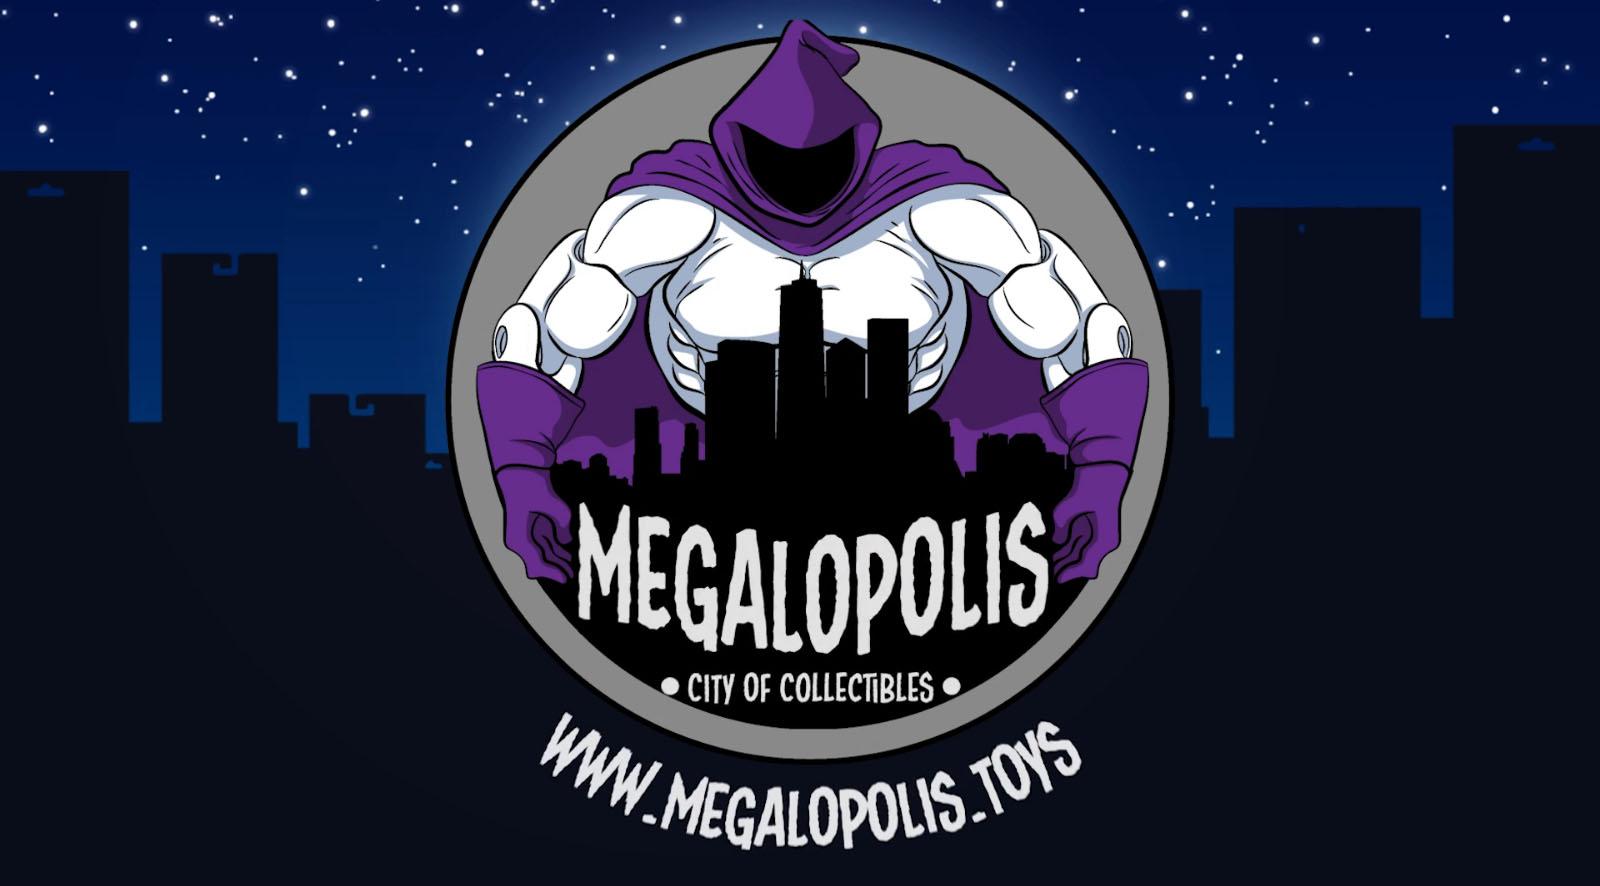 Megalopolis-Toys-Banner-2.jpg